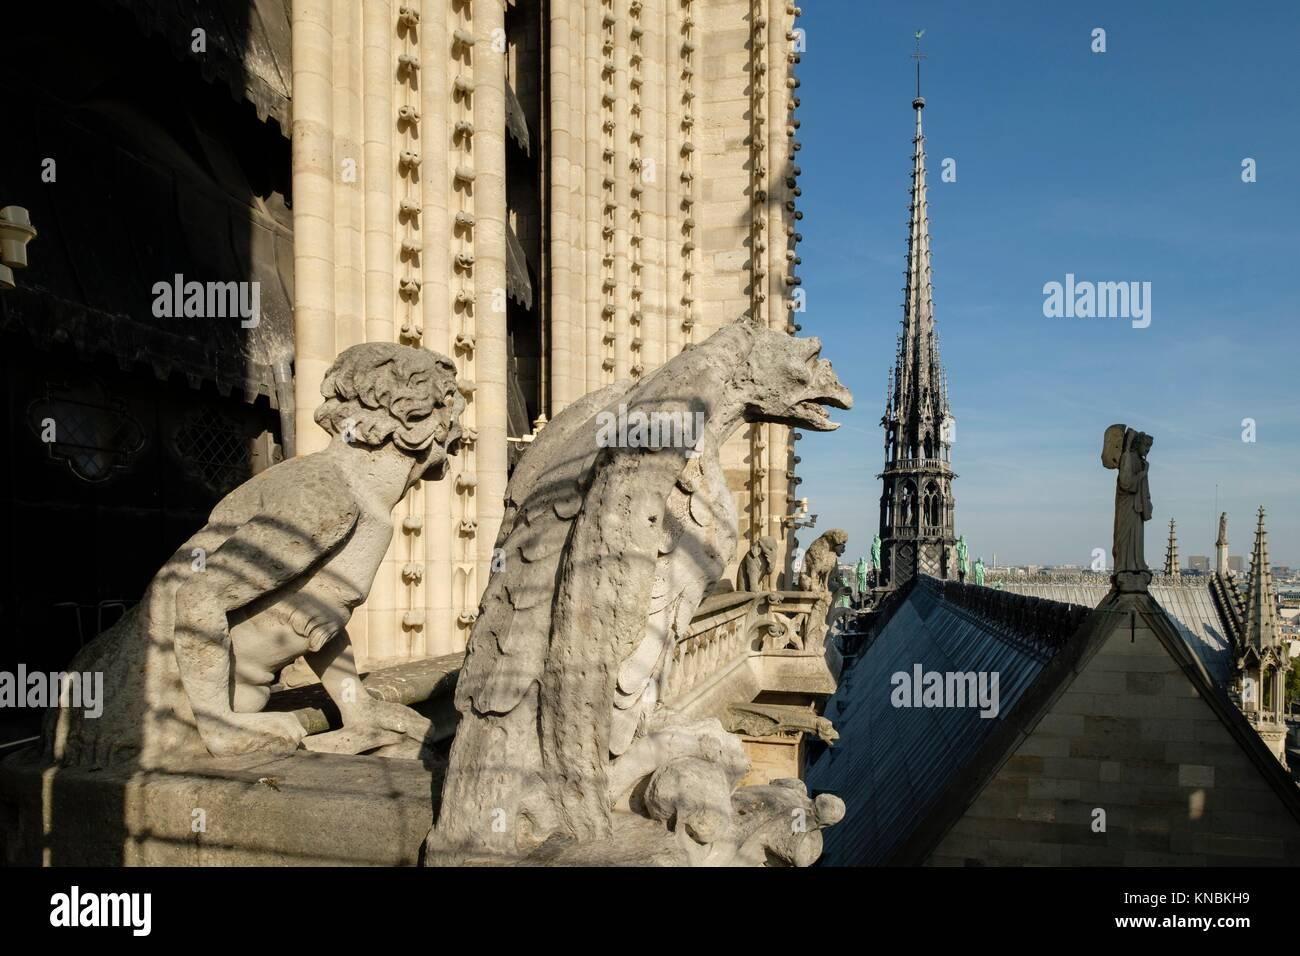 Gargoyles, Notre Dame Cathedral, Paris, France - Stock Image